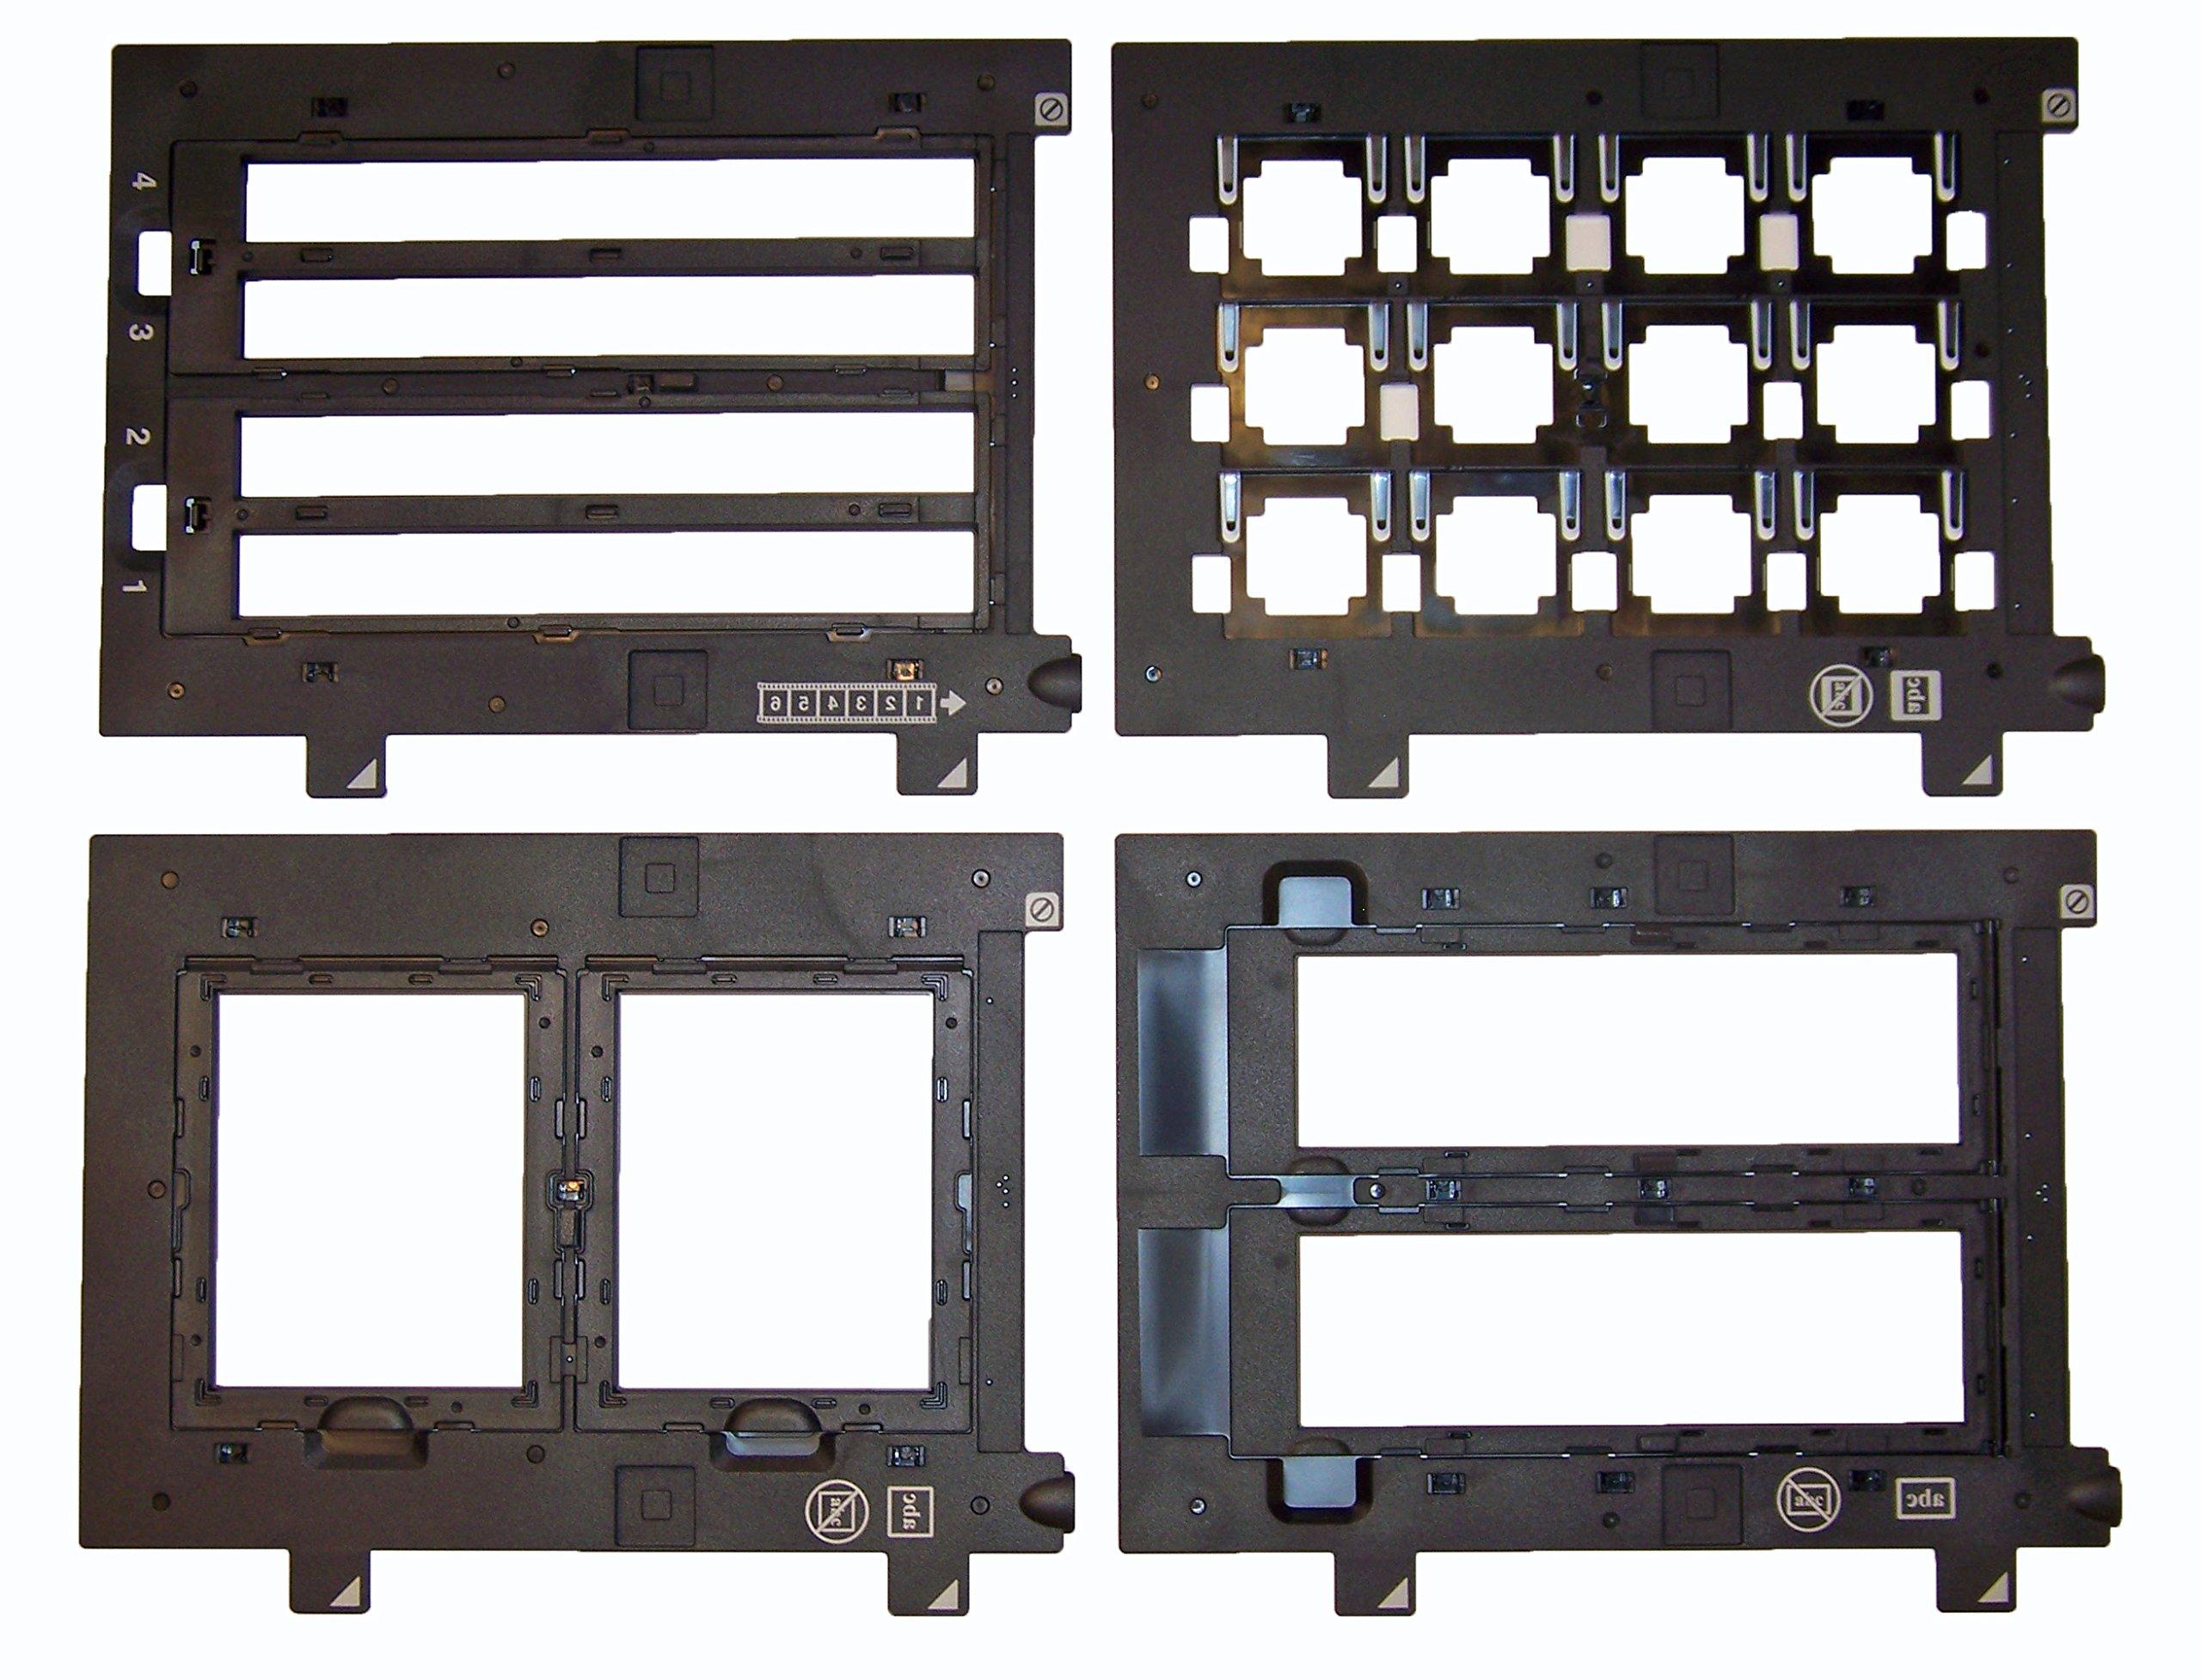 Epson Perfection V700 - Bundle! Includes Slide Holder, 4x5 Holder, 35mm Holder & 120 Holder! All 4 Holders!